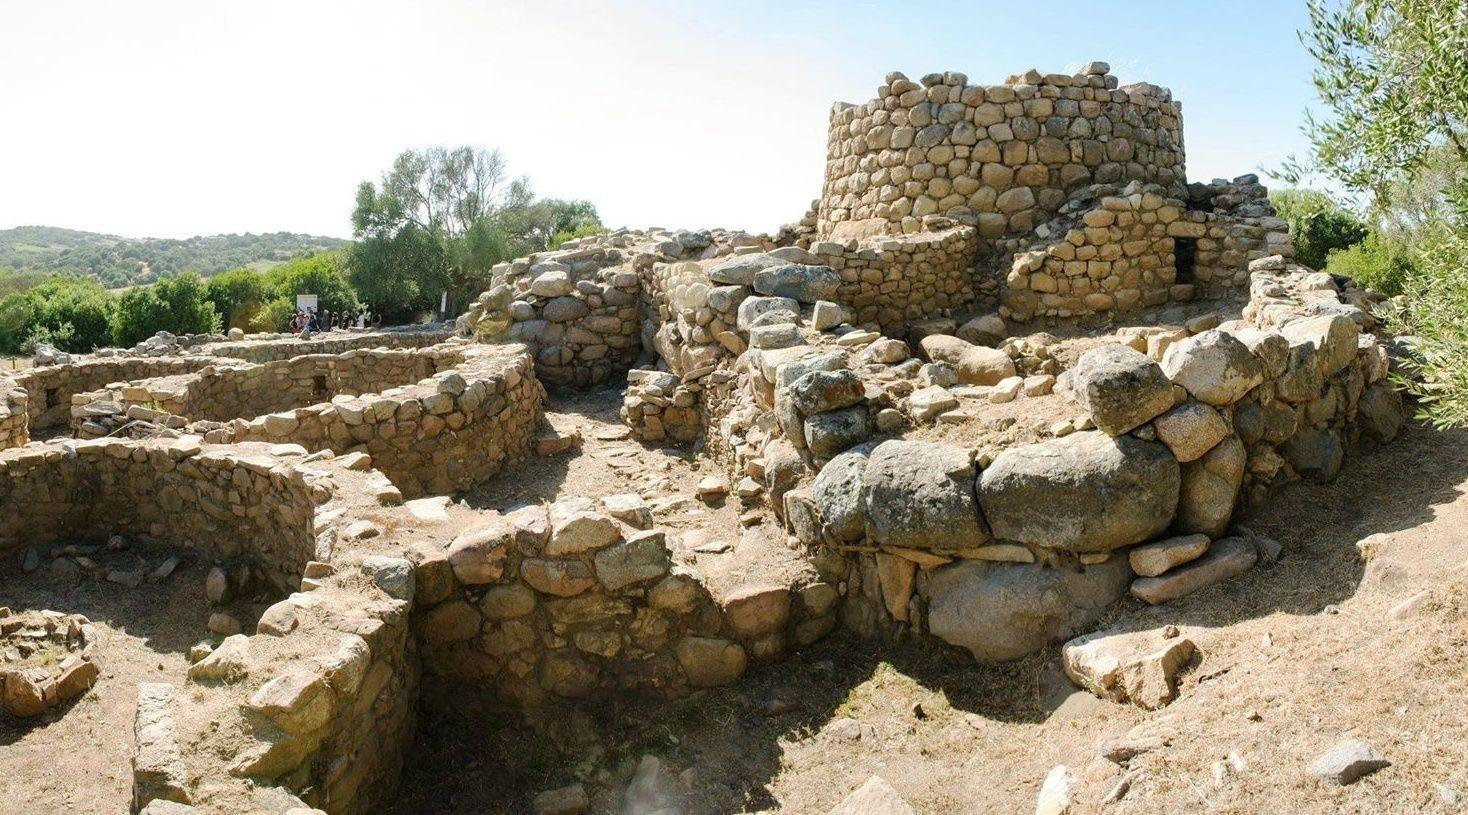 ARCHEOLOGICAL AREA OF ARZACHENA